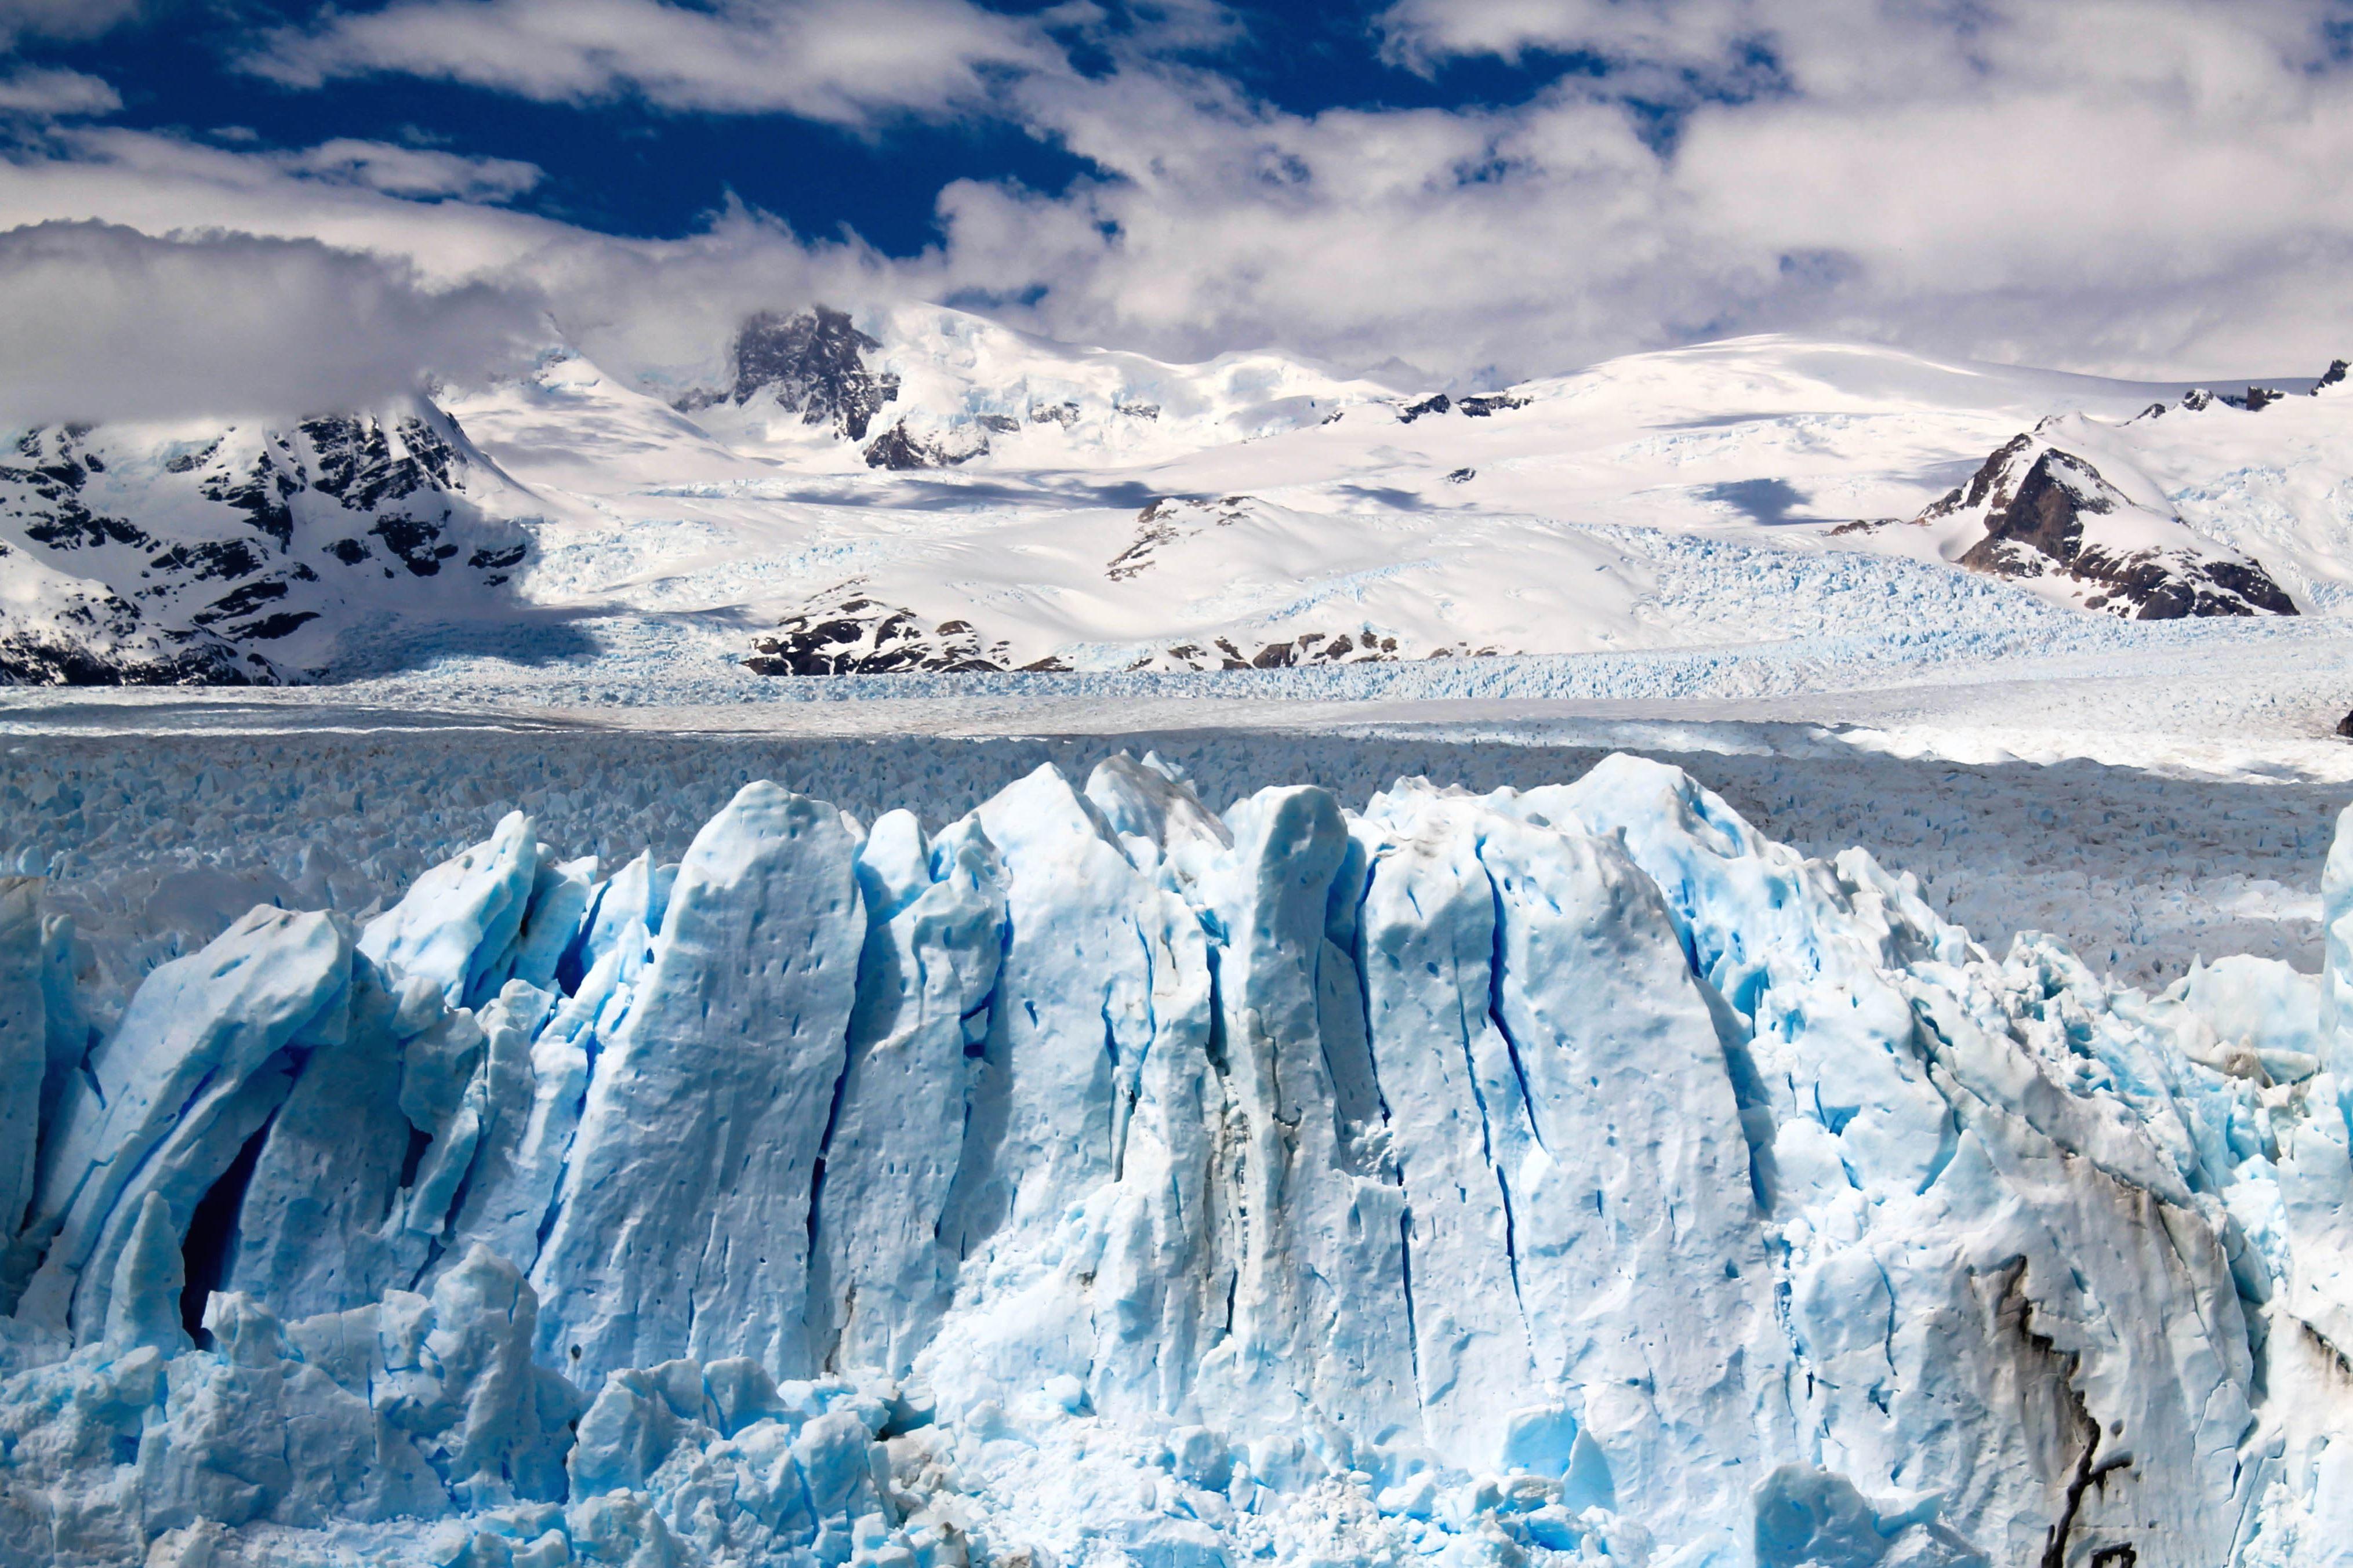 imagen gratis nieve invierno fr o congelado glaciar